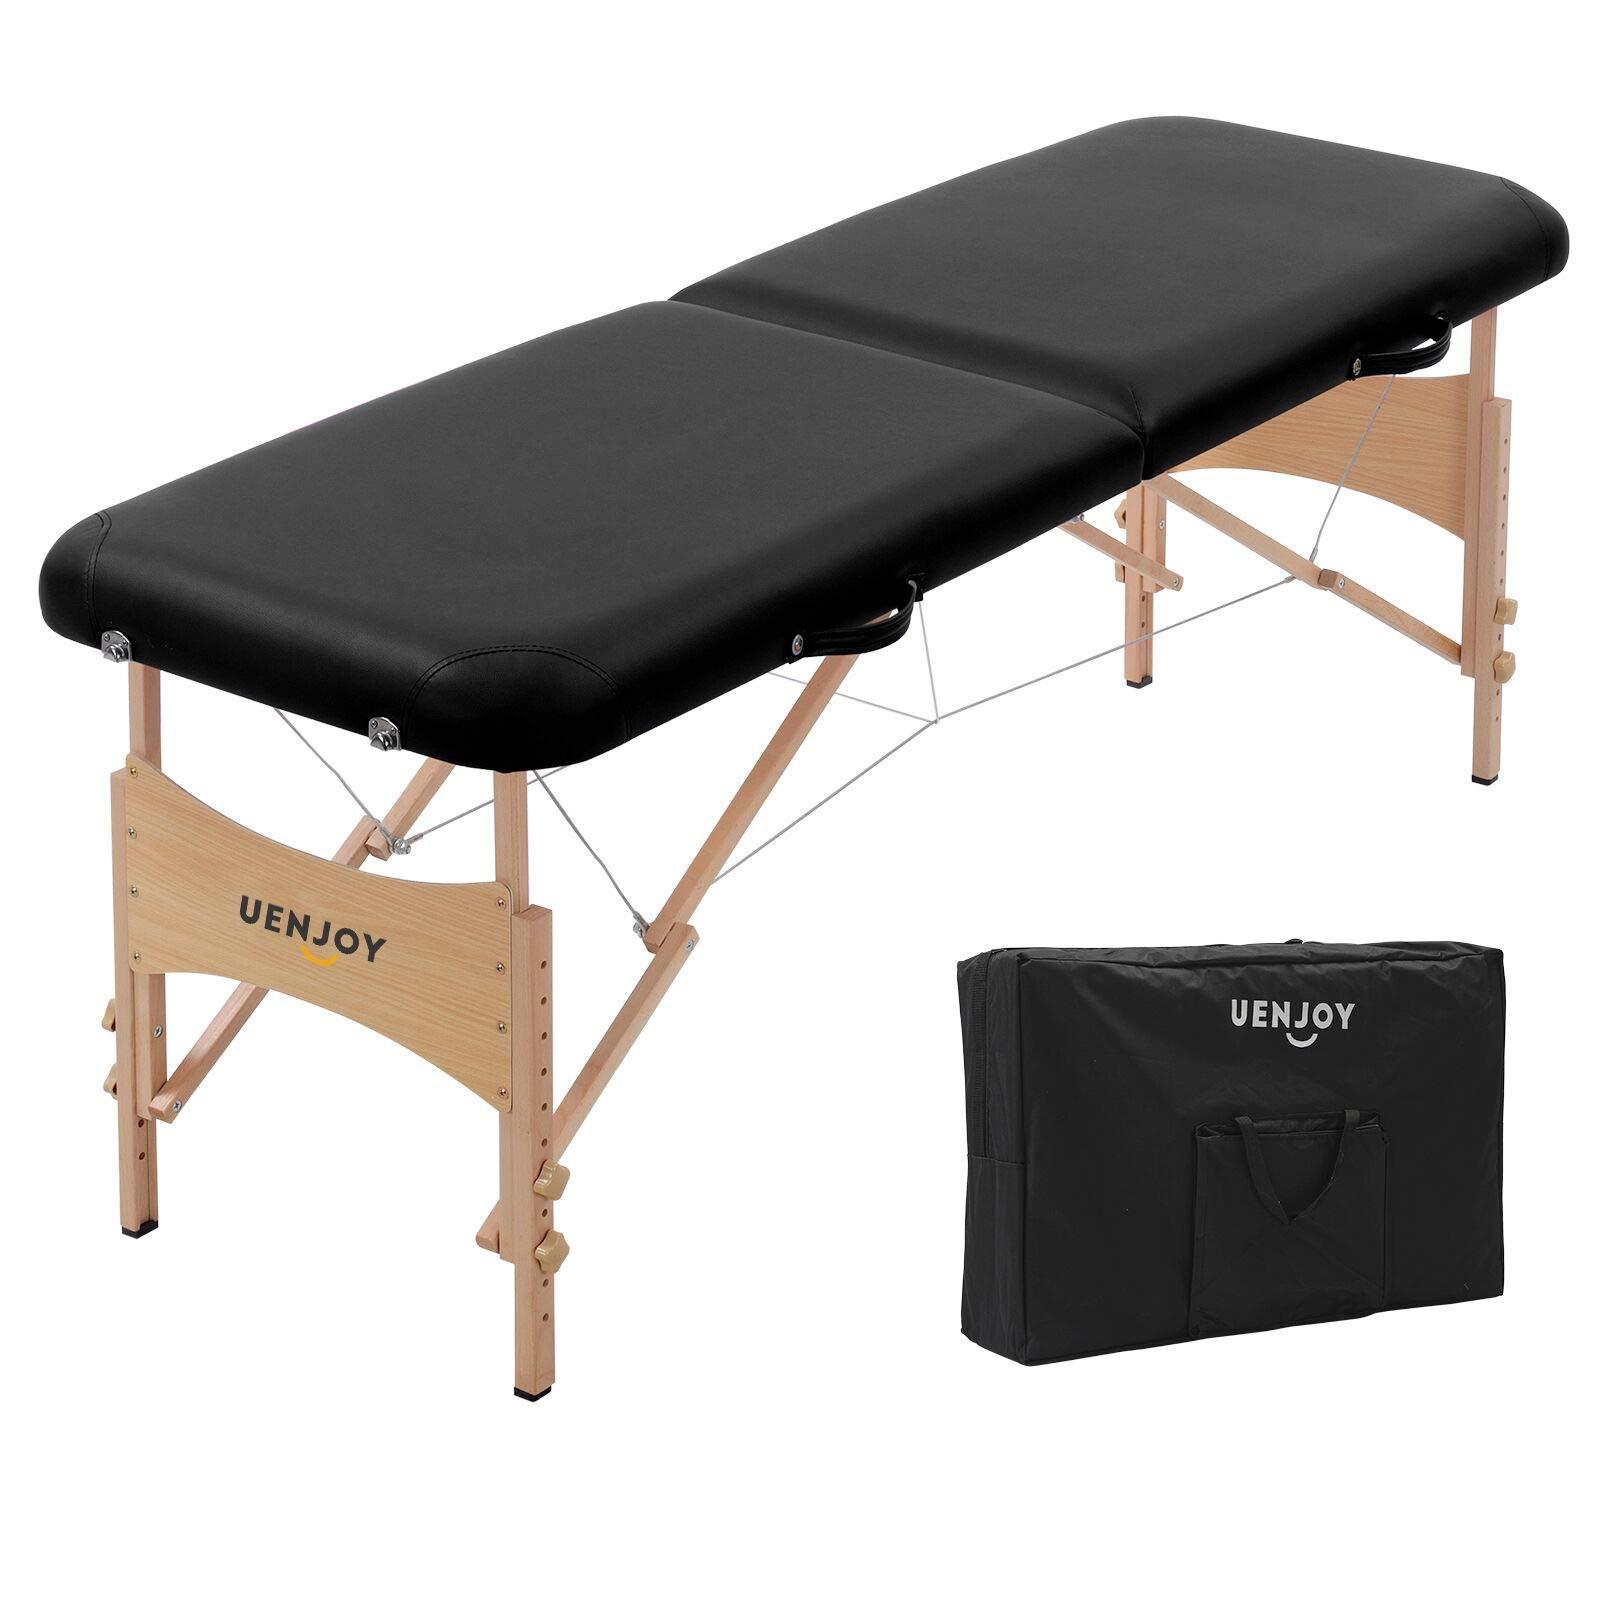 Uenjoy Massage Bed 72'' Professional Folding Massage Table 2 Fold, Basic & Portable, Black by Uenjoy